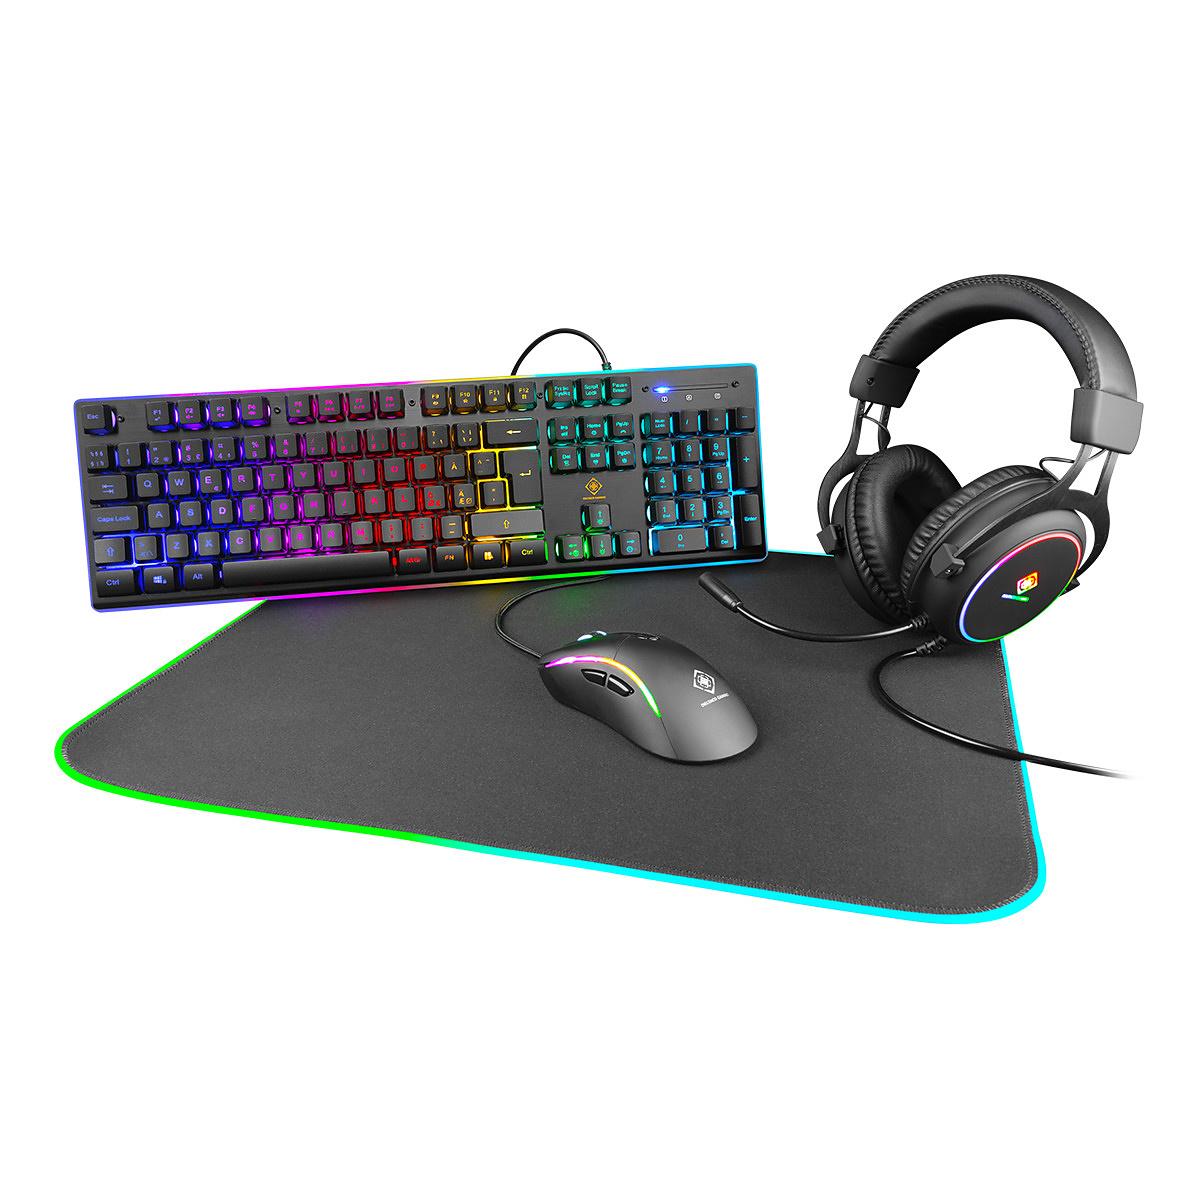 DELTACO GAMING 4-in-1 RGB Gaming kit